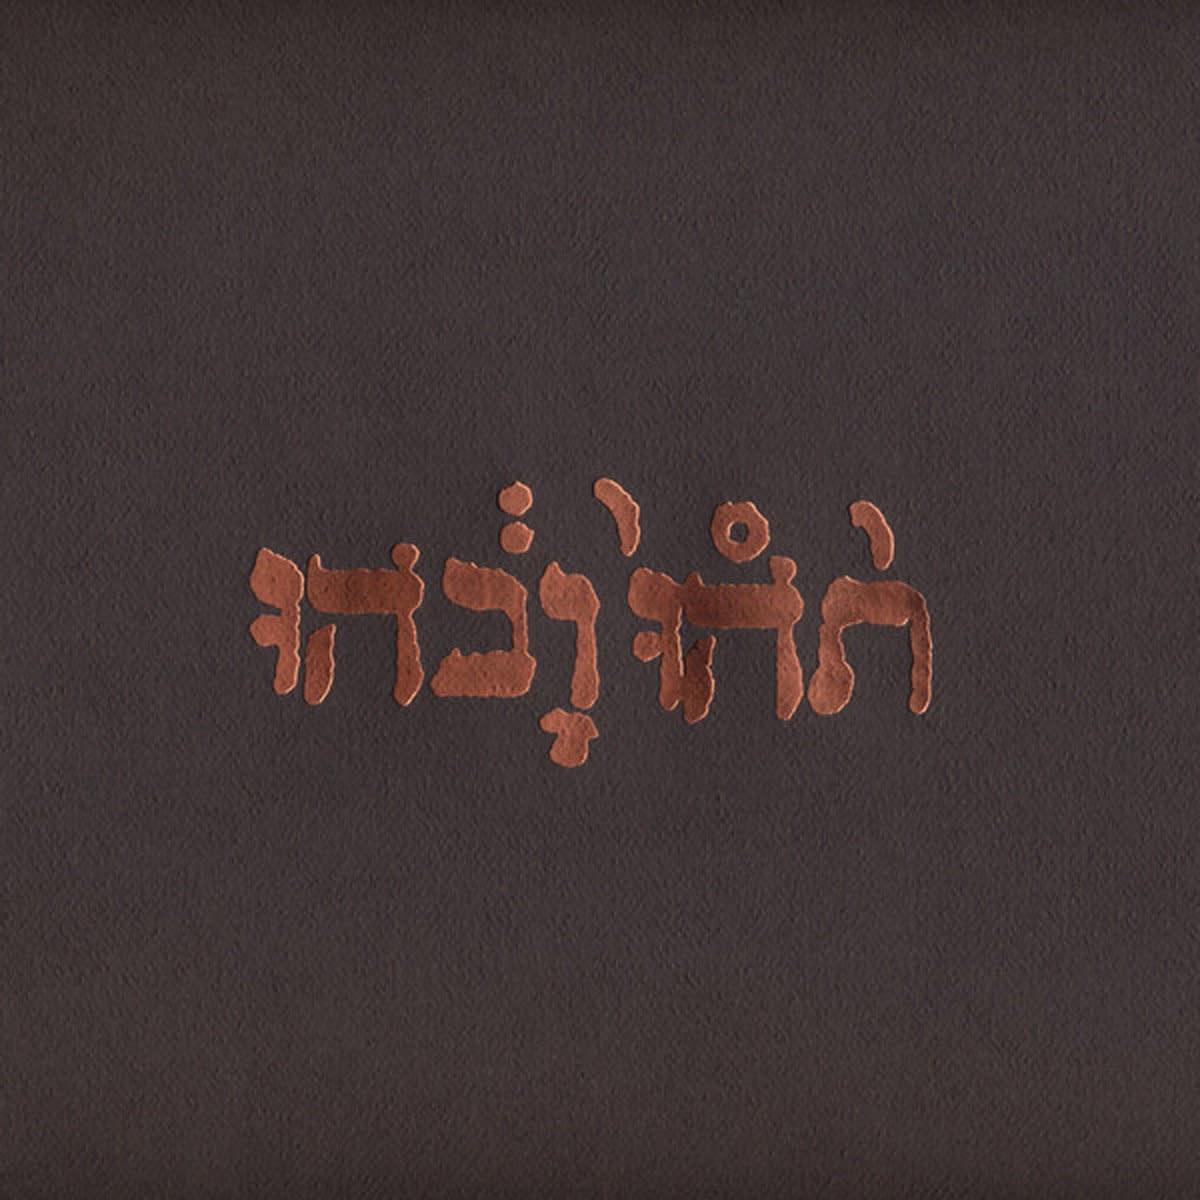 Constellation Godspeed You! Black Emperor -  Slow Riot for New Zero Kanada